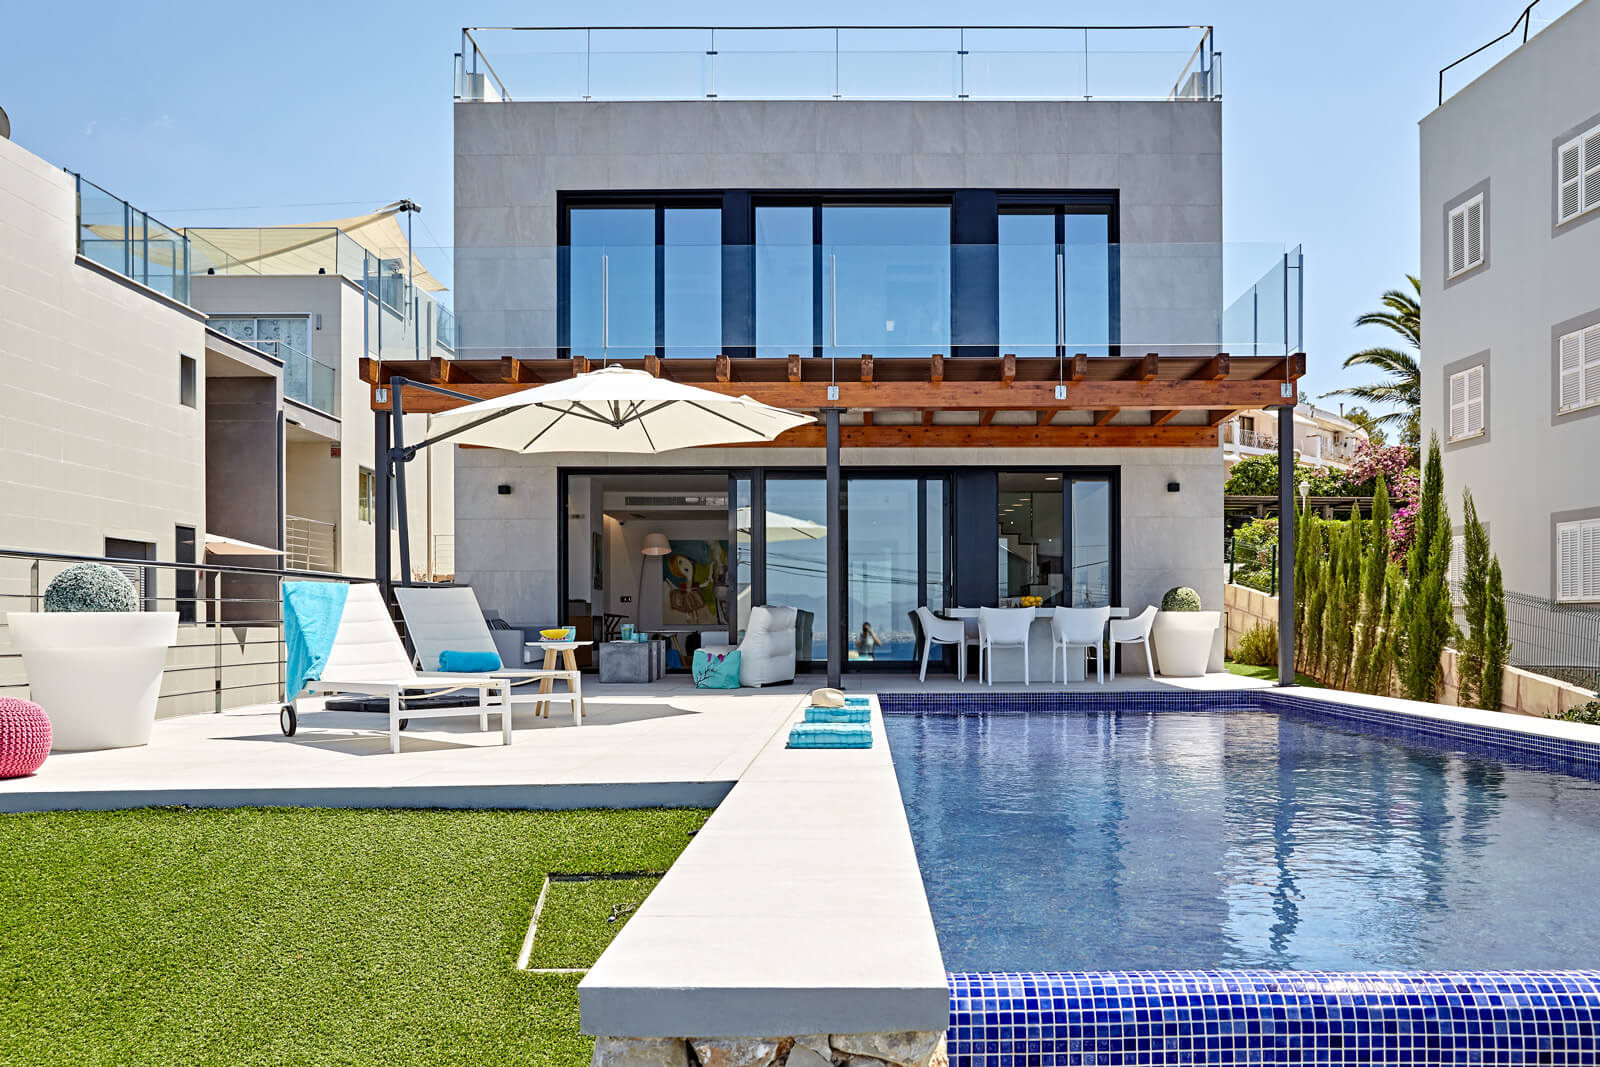 Villa Bahia Palma Pool mit Blick auf das Haus